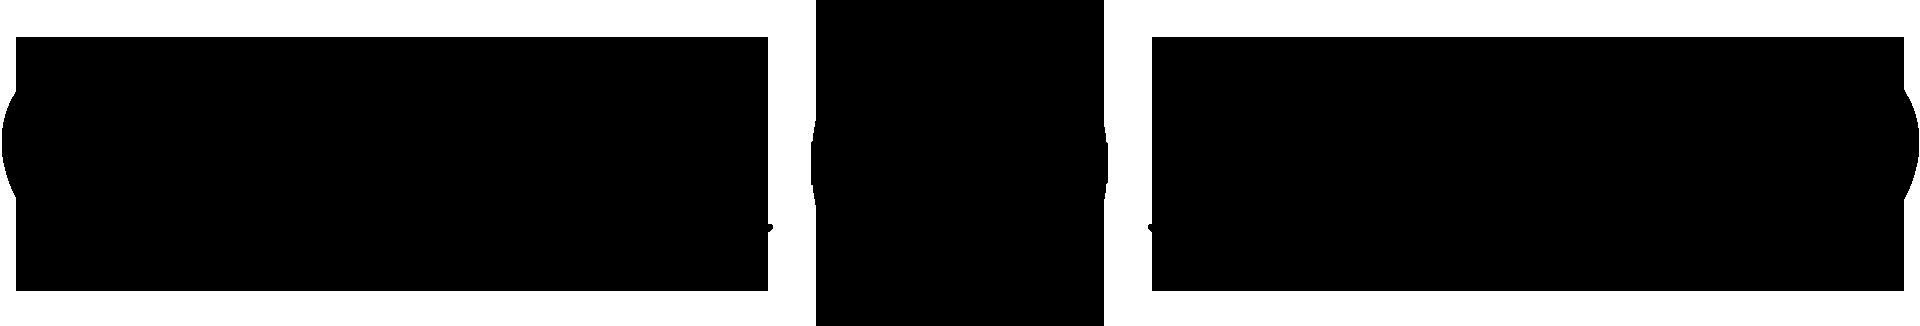 the-crown-line-black